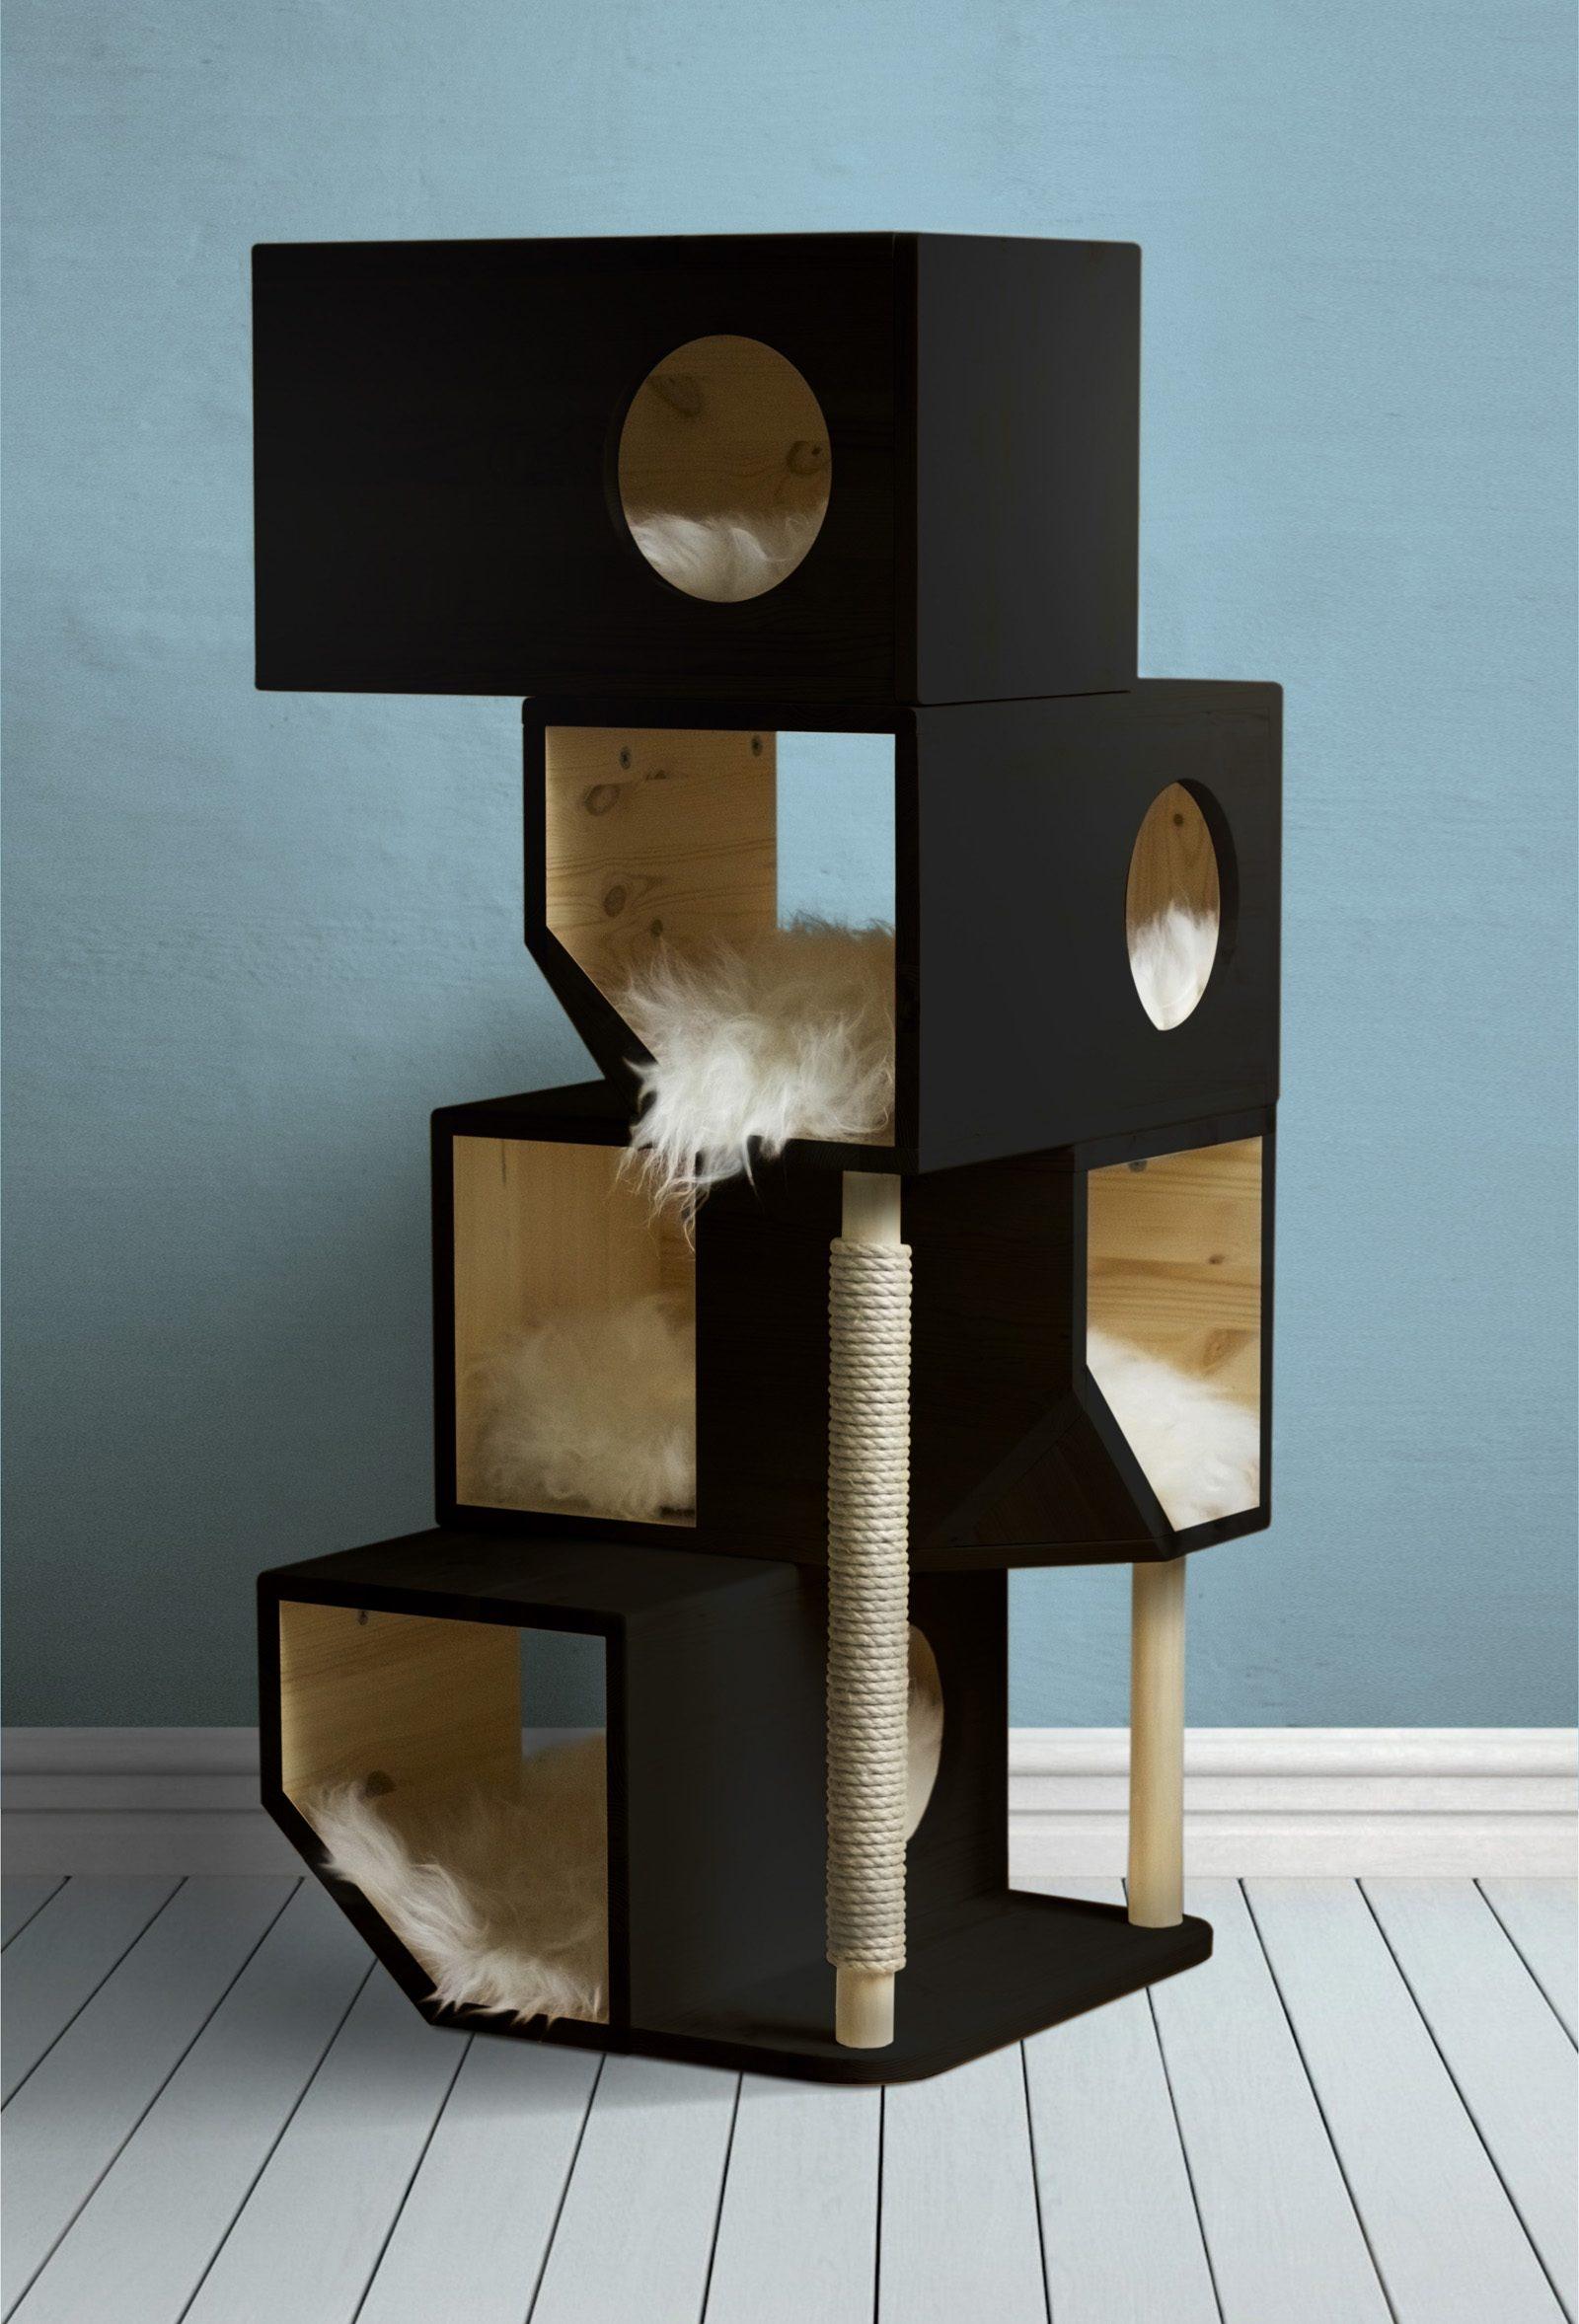 Freestanding 4 storey cat house  by Catissa